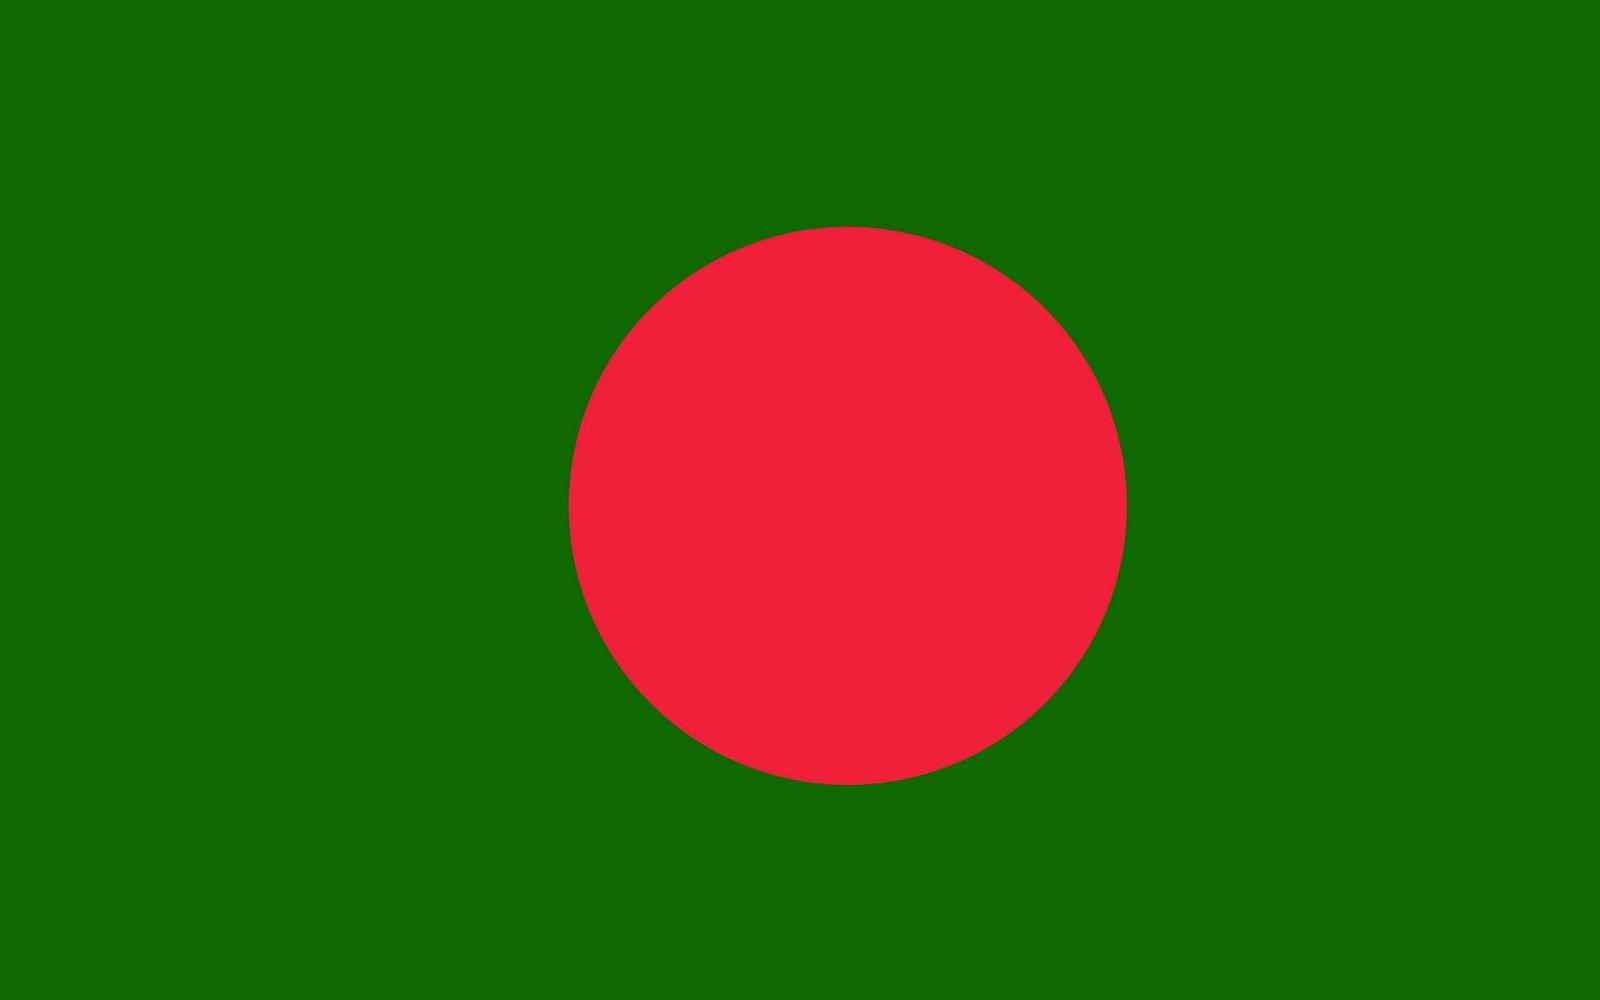 Travcour Visa & Legalisation Services Limited Bangladesh Visa Application